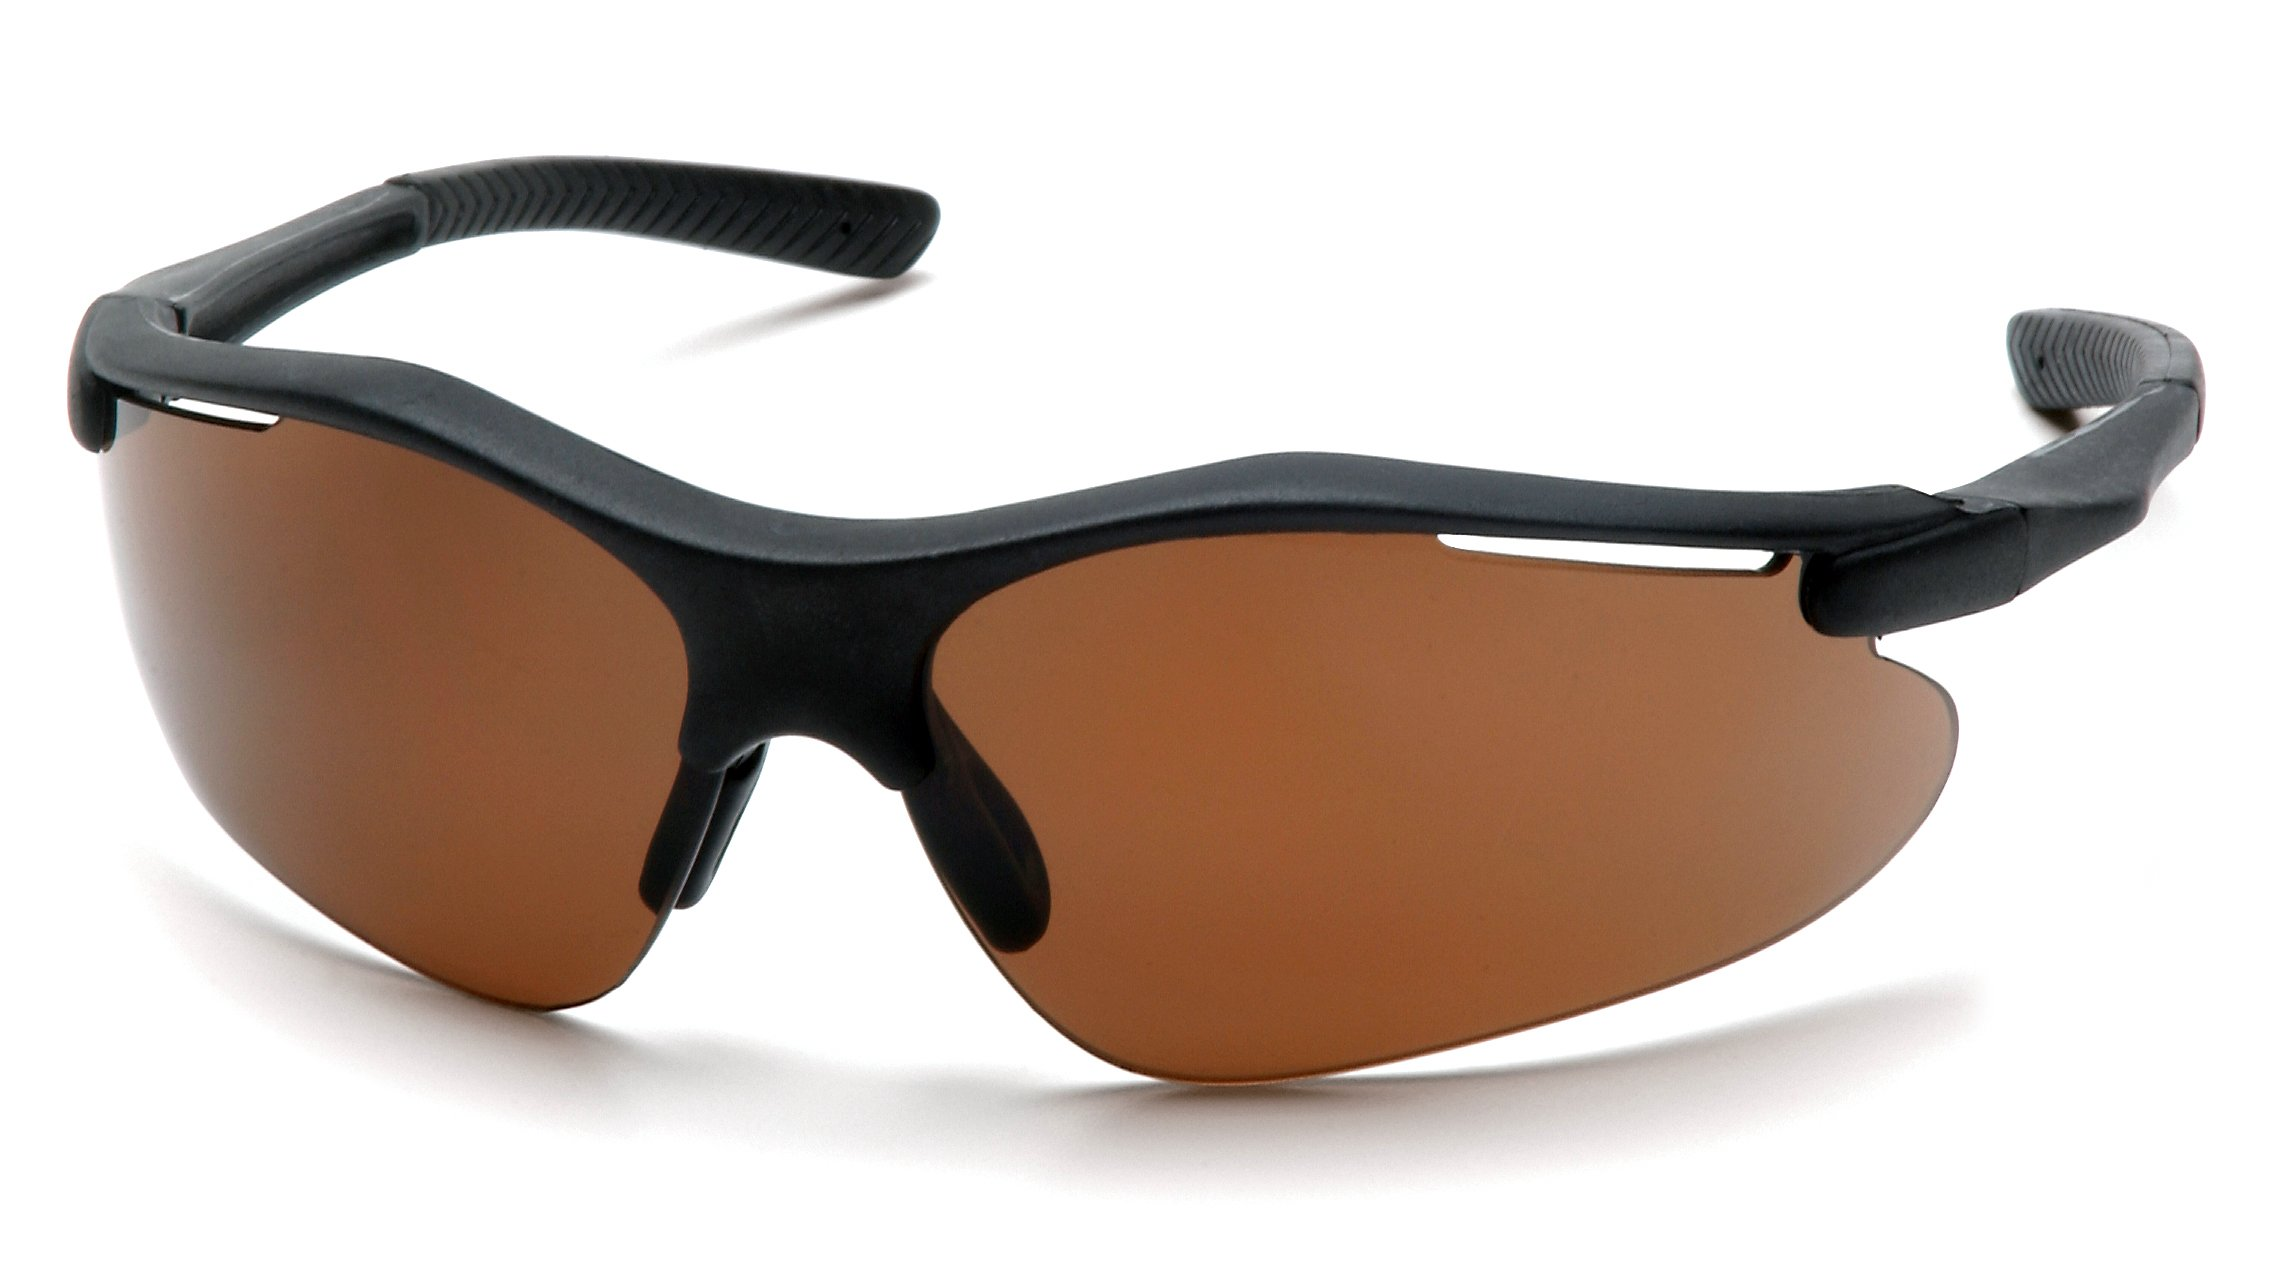 Pyramex Fortress Safety Eyewear, Coffee Lens With Black Frame